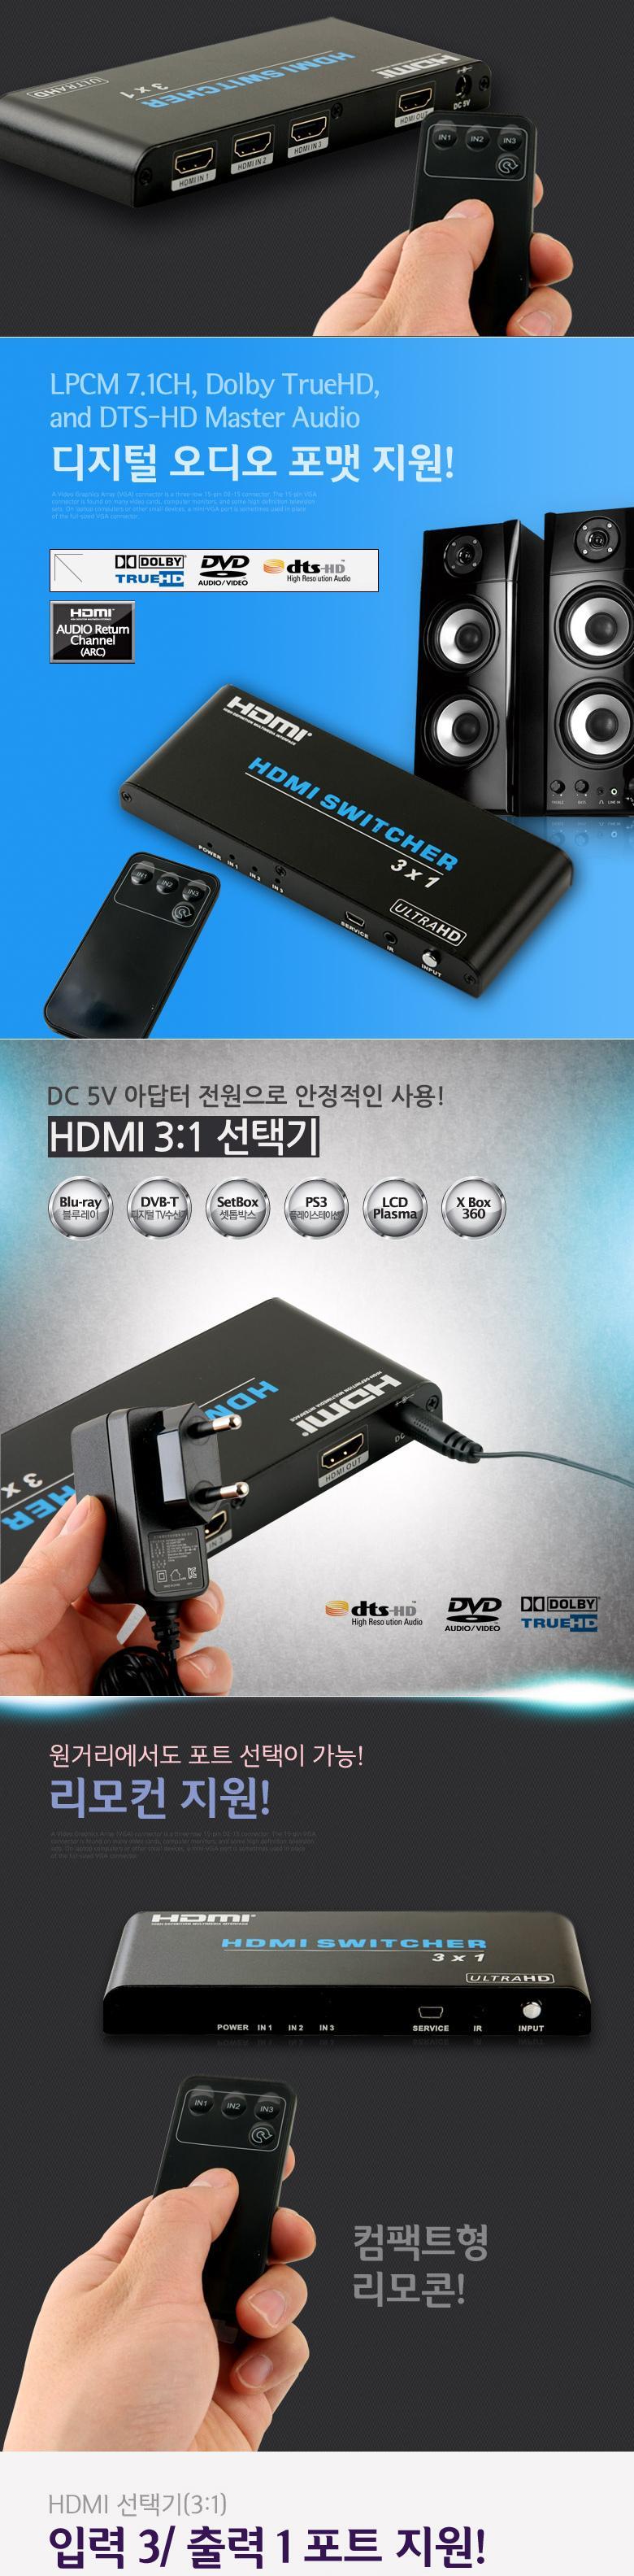 PV991 Coms HDMI 선택기 (3:1) 2.0 지원 4K2K (60Hz). 리모콘 컴퓨터용품 컴퓨터부품 PC부품 PC용품 분배기 컴퓨터액세사리 PC액세사리 PC관련용품